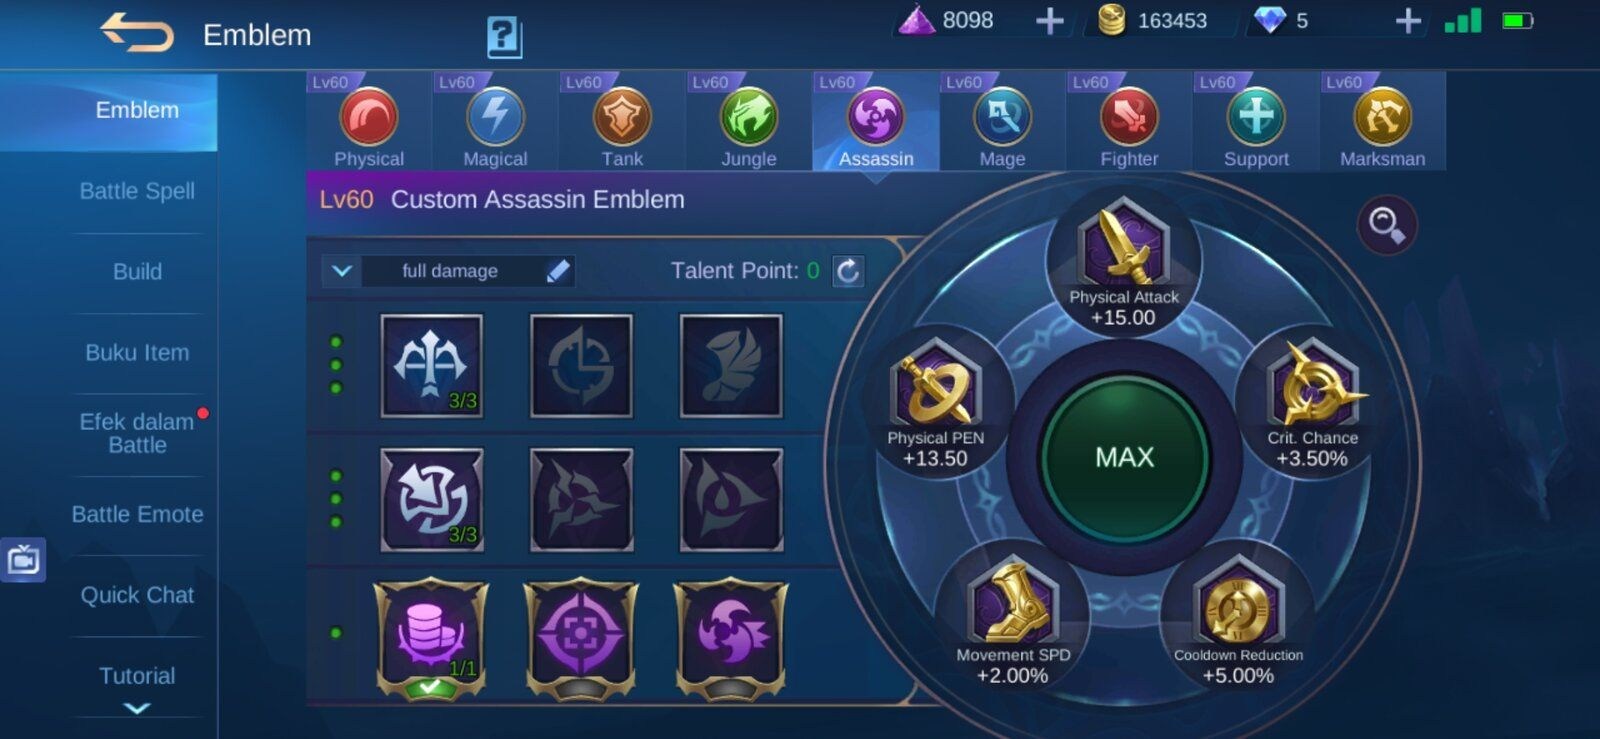 Screenshot_20200127-045548_Mobile Legends Bang Bang.jpg